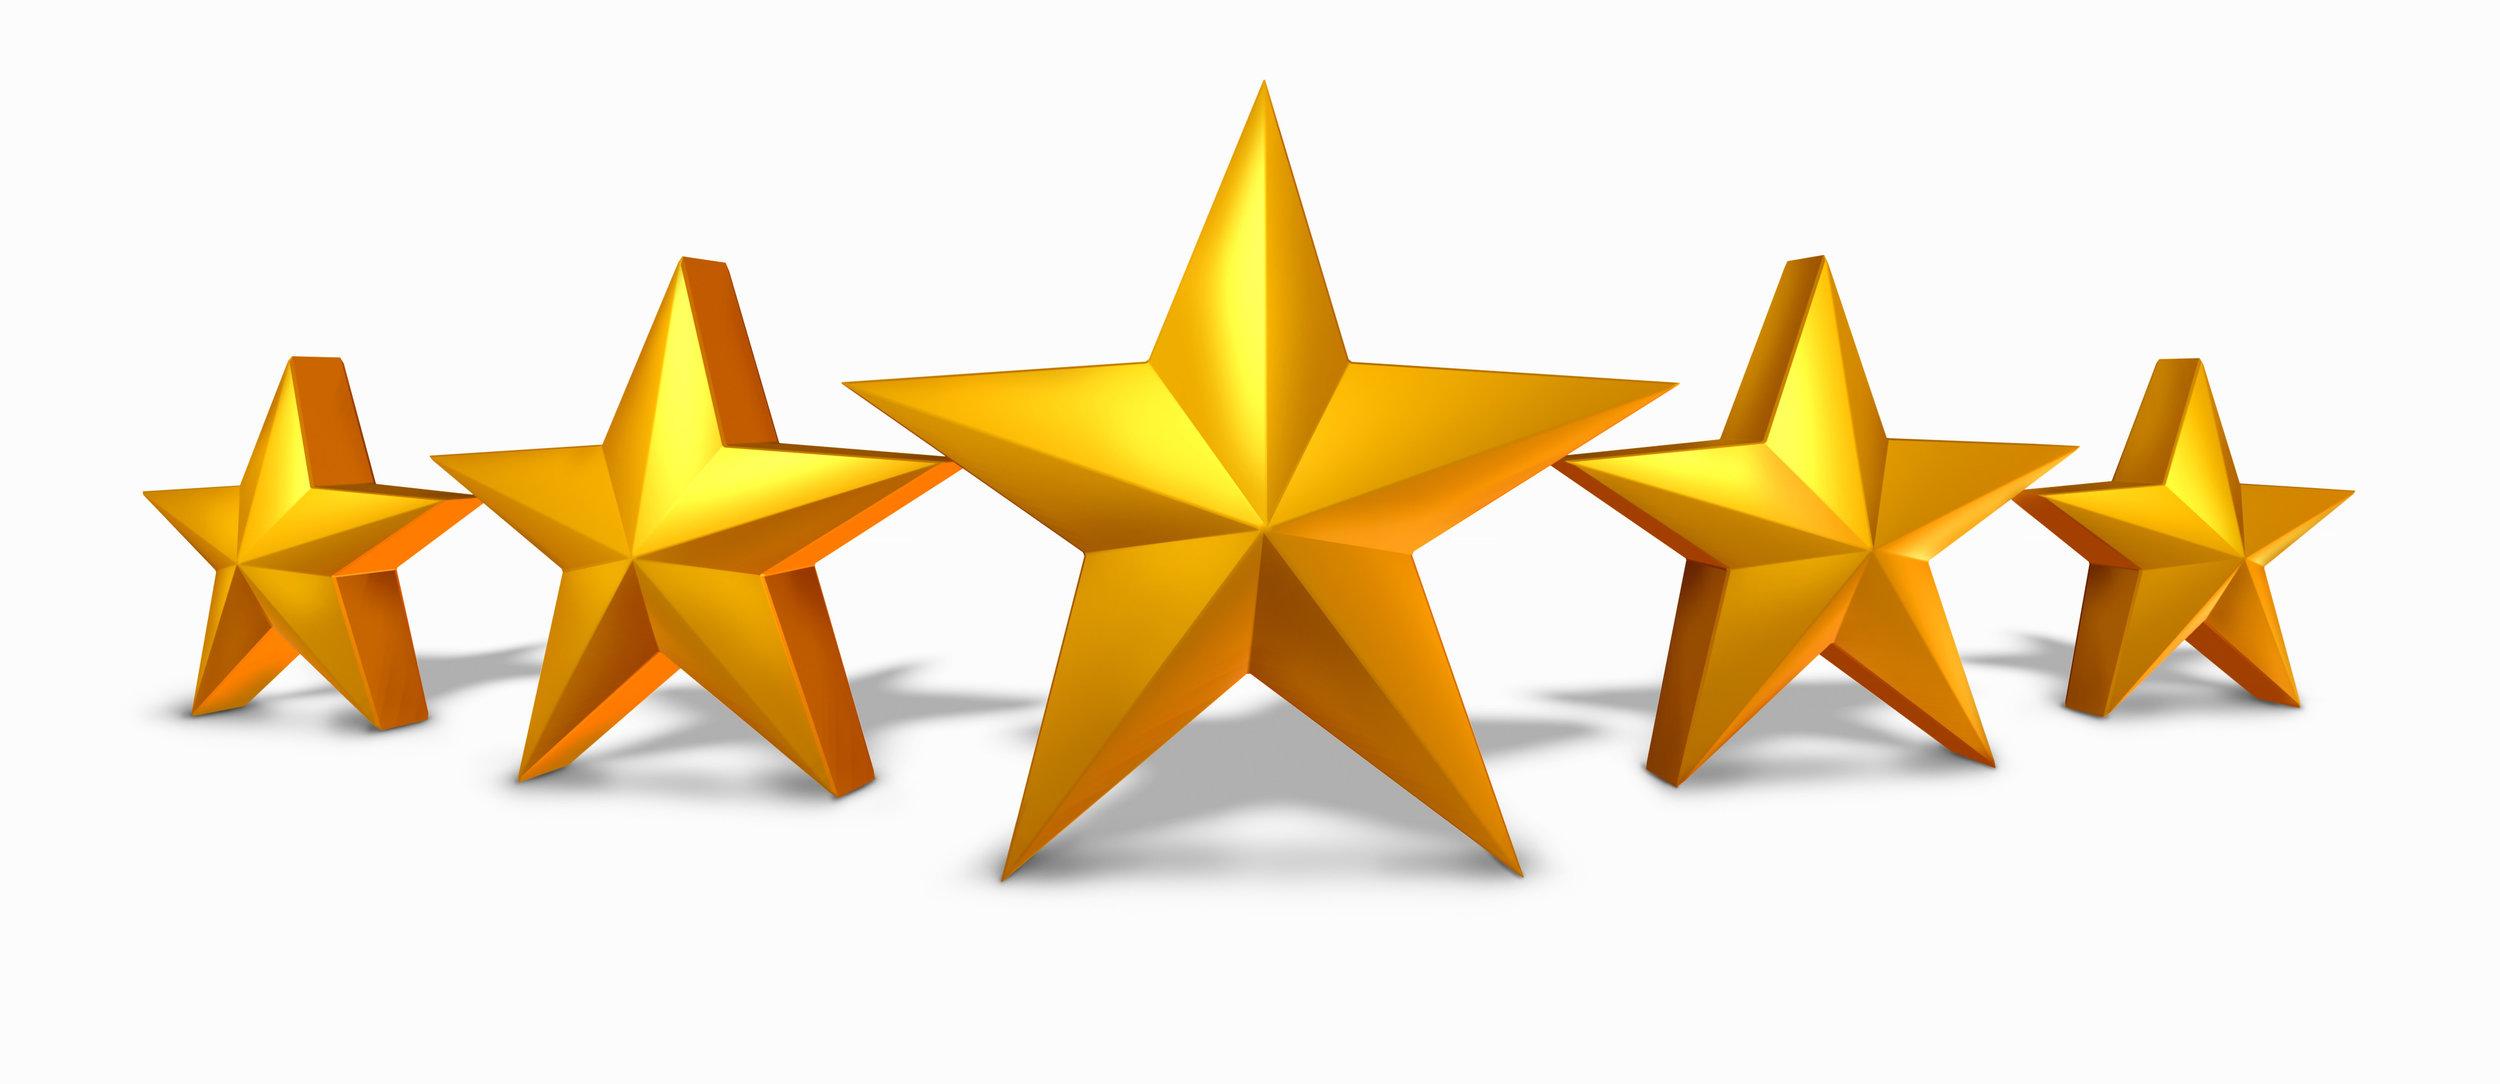 Best Orlando Dentist, East Orlando, Central Florida, Cosmetic dentistry, Spanish Speaking, Implants, Emergencies, Orthodontics, Pediatrics, Braces, Root Canal, Endodontics, Cone Beam CT, Family dentistry, Affordable, Whitening, Wisdom teeth extractions, Sedation